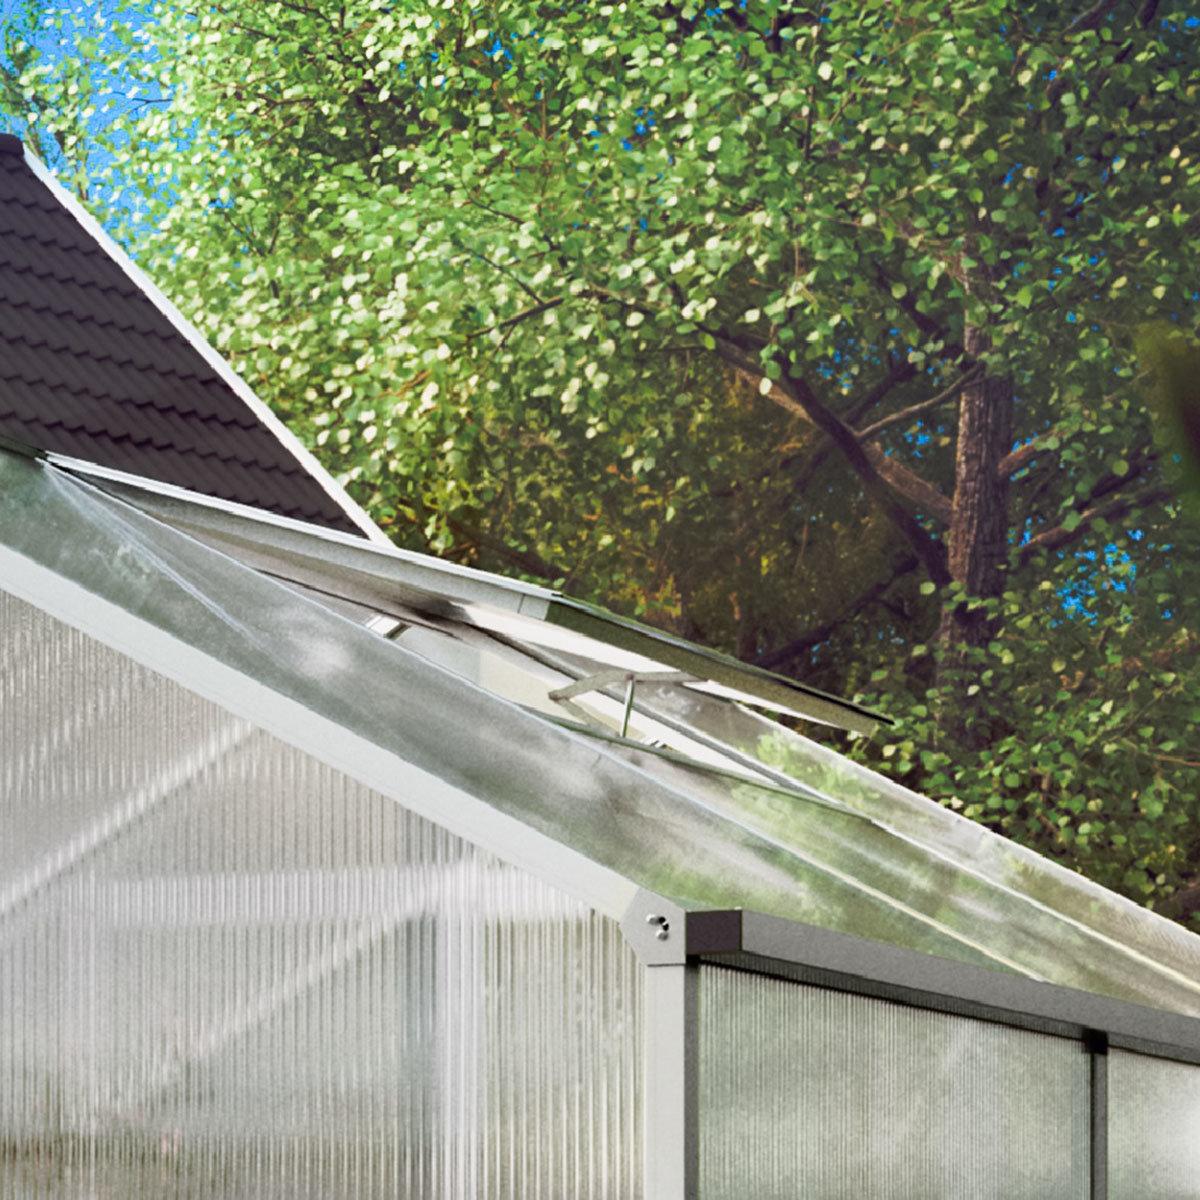 KGT Gewächshaus Tulpe III 233 x 323 cm, moosgrün | #8